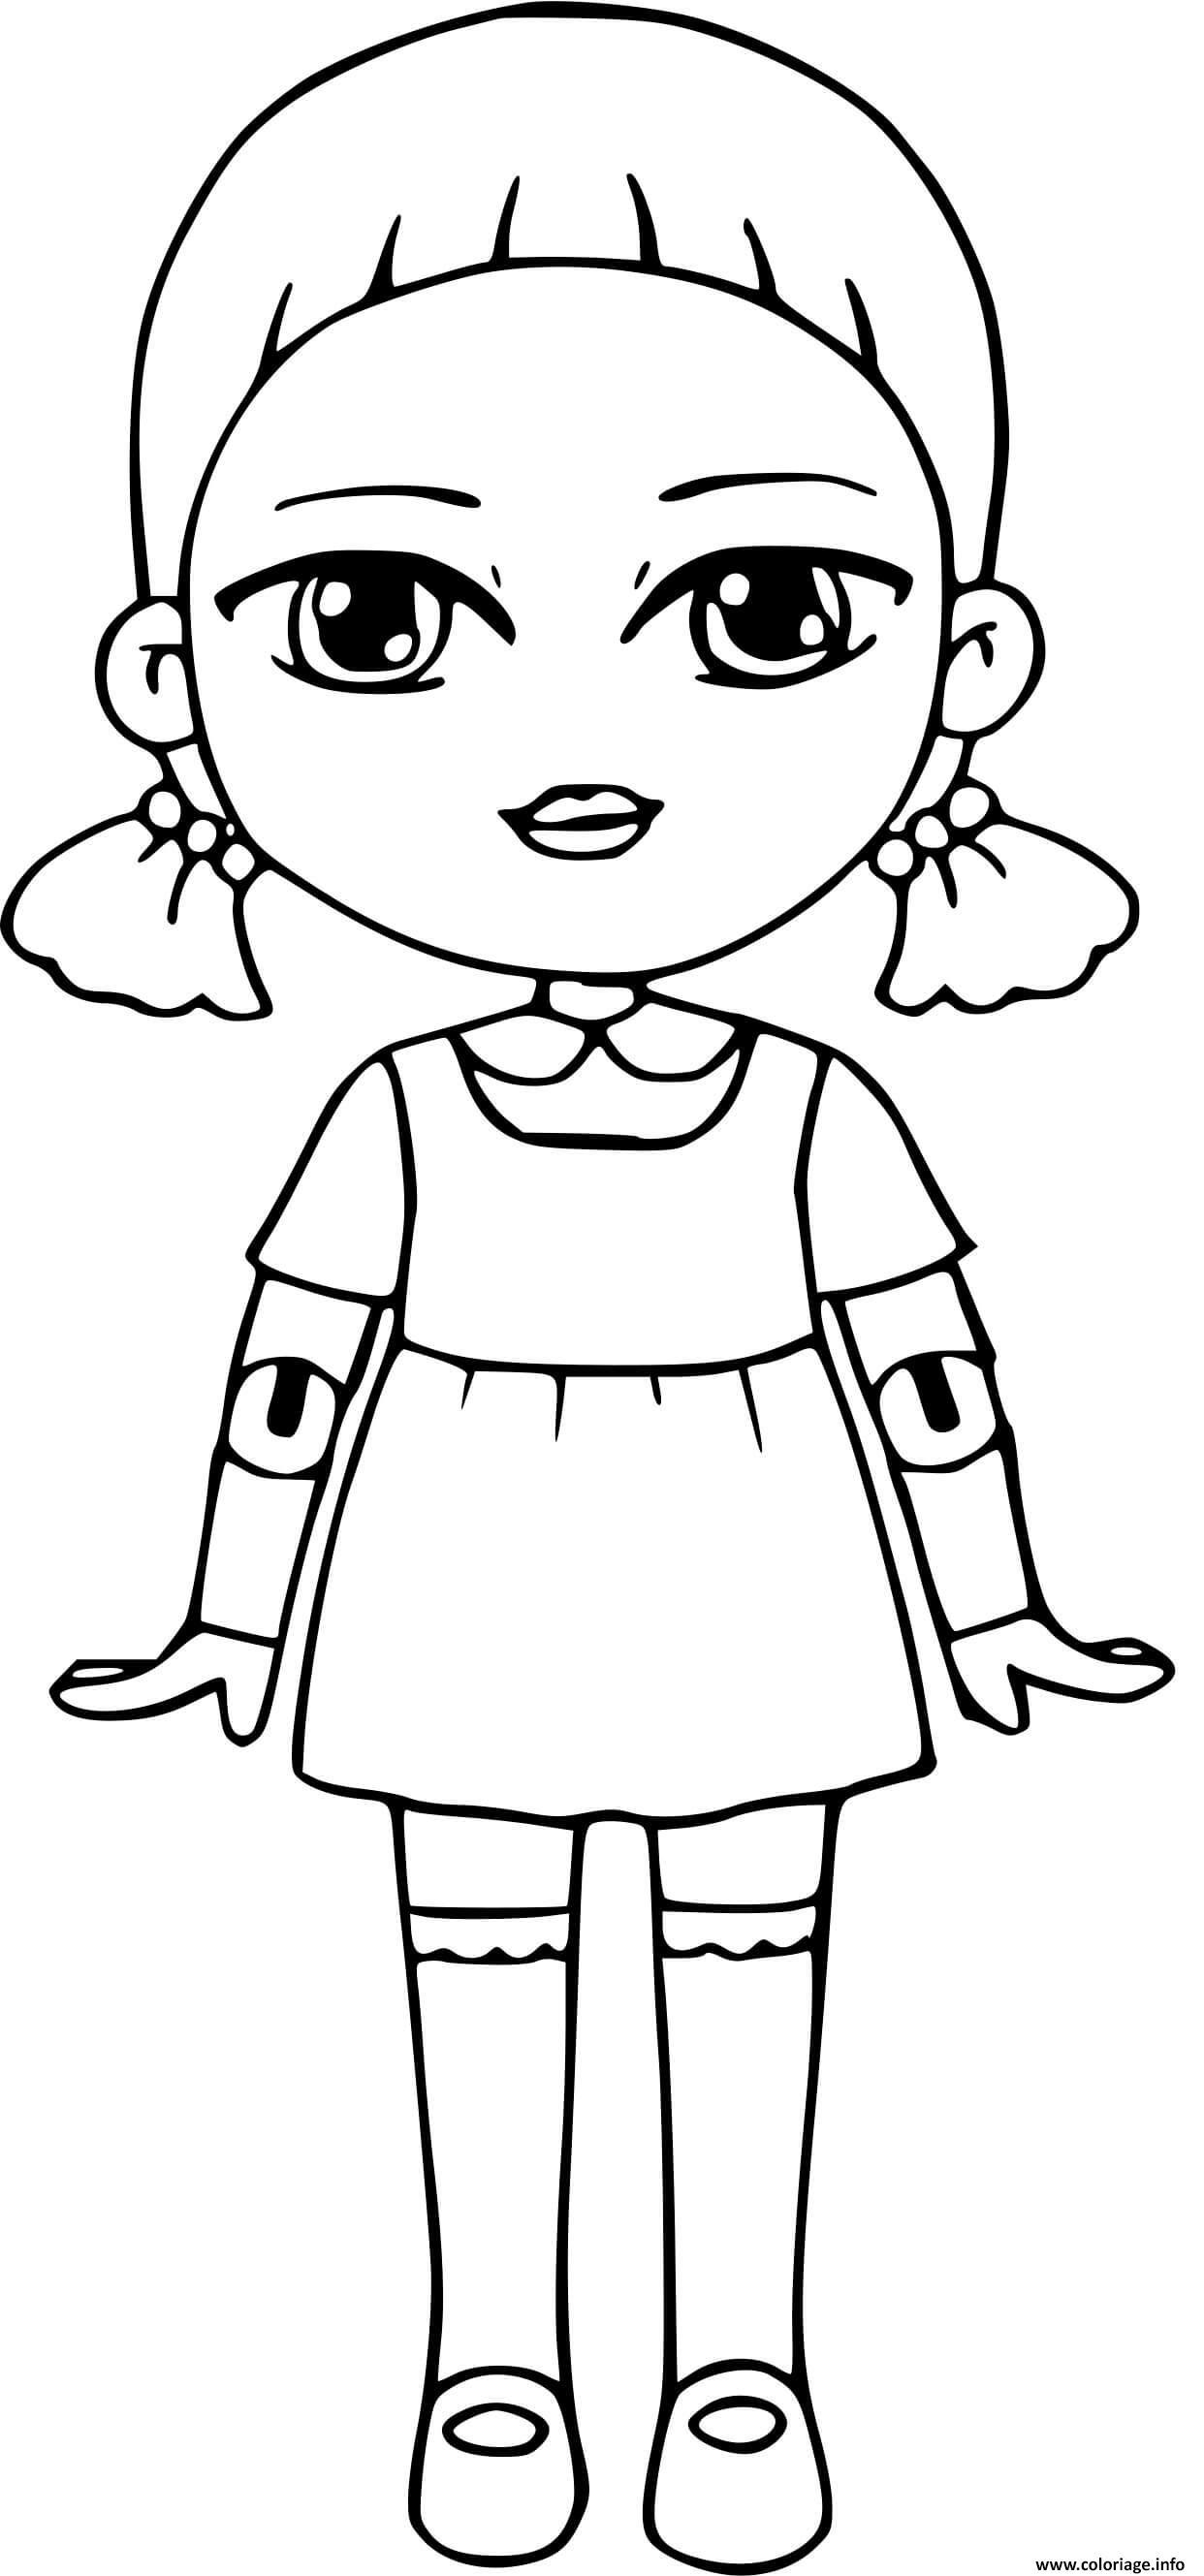 Dessin squid game red light green light doll Coloriage Gratuit à Imprimer